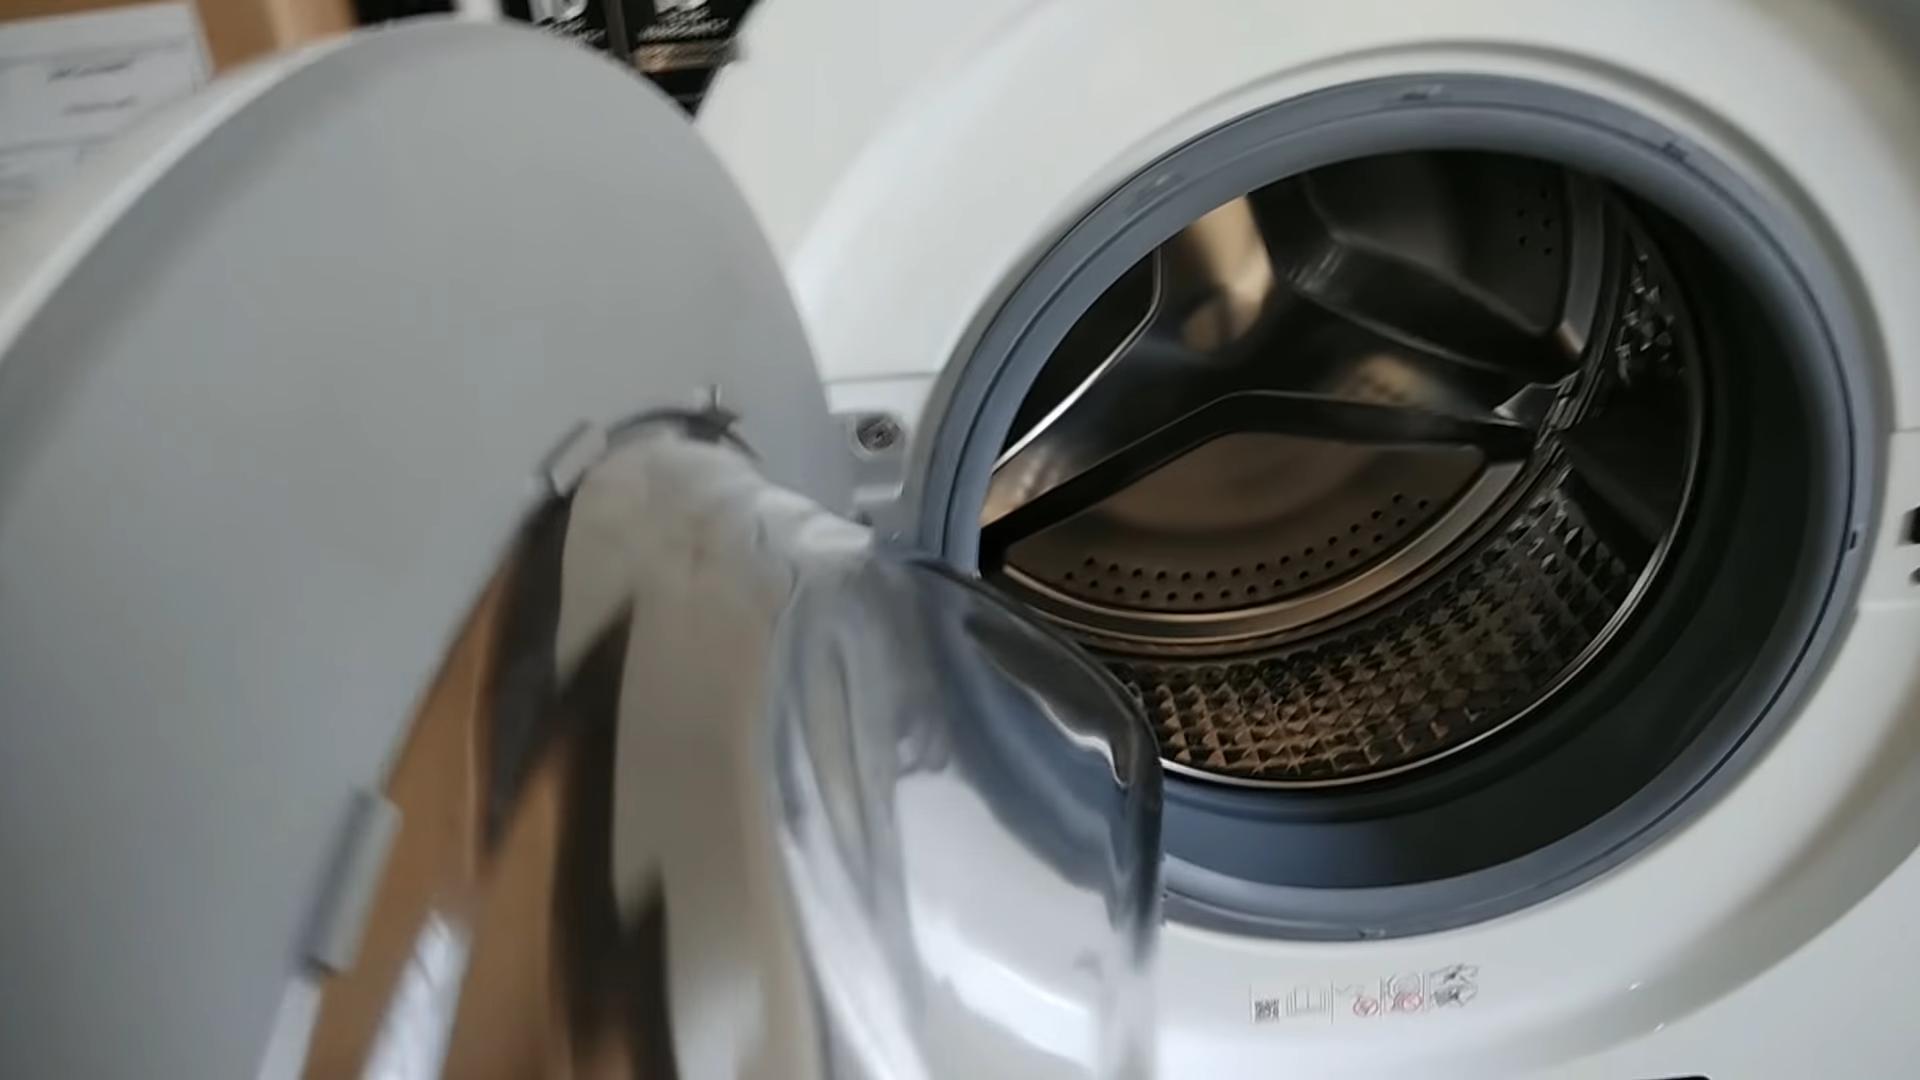 Floodchek Washing Machine Hoses Roper Washing Machine Review